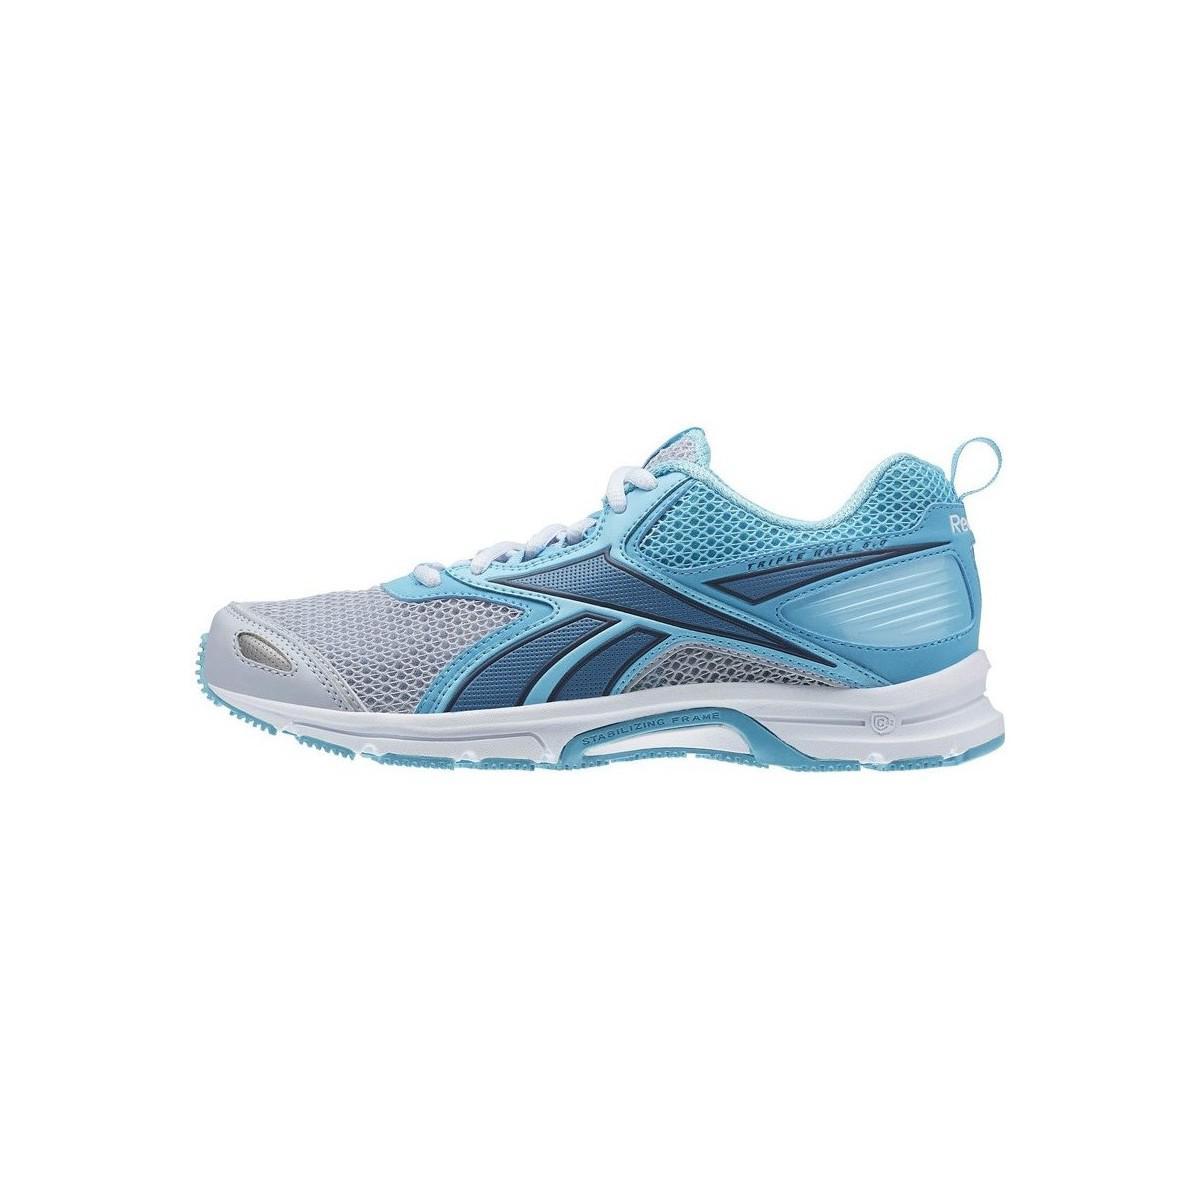 34be2e943be2 Reebok - Triplehall 50 Women s Shoes (trainers) In White - Lyst. View  fullscreen